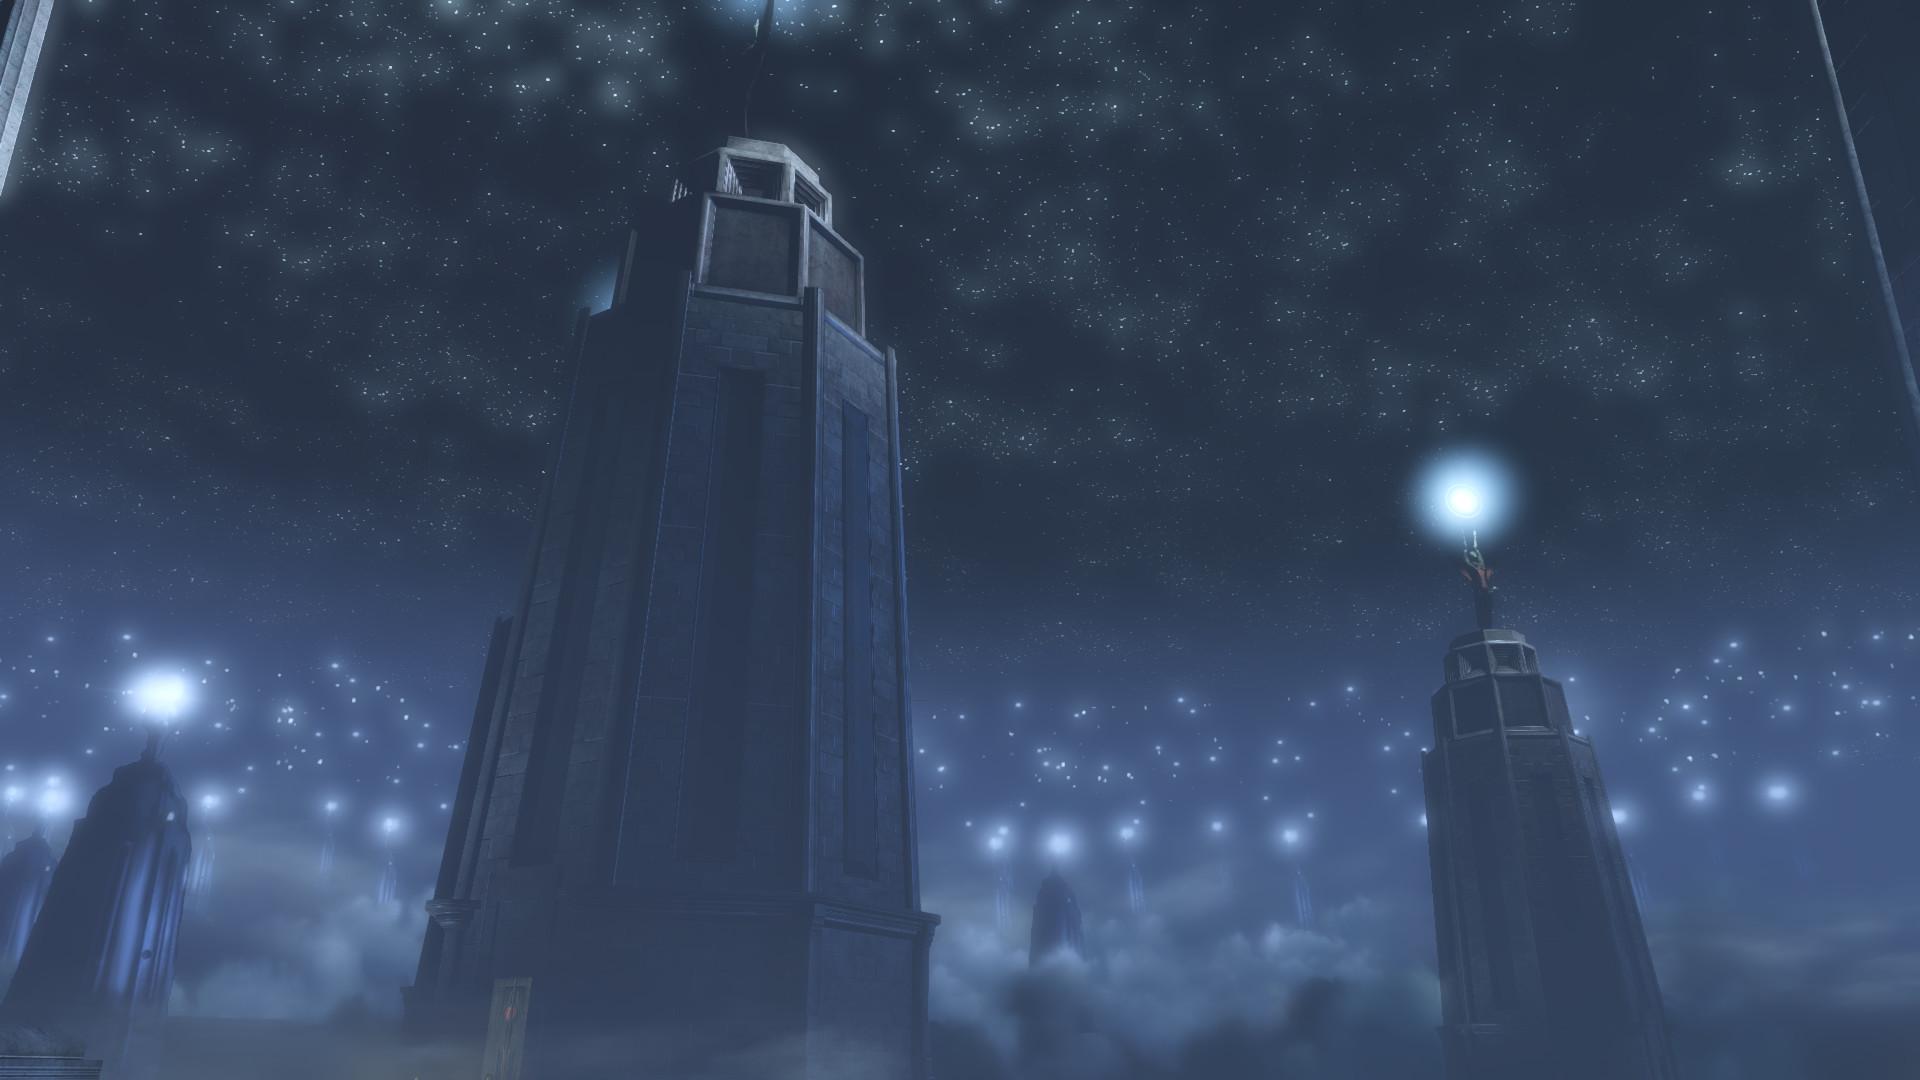 … Each Lighthouse a Door [Bioshock Infinite] by Bankaii94